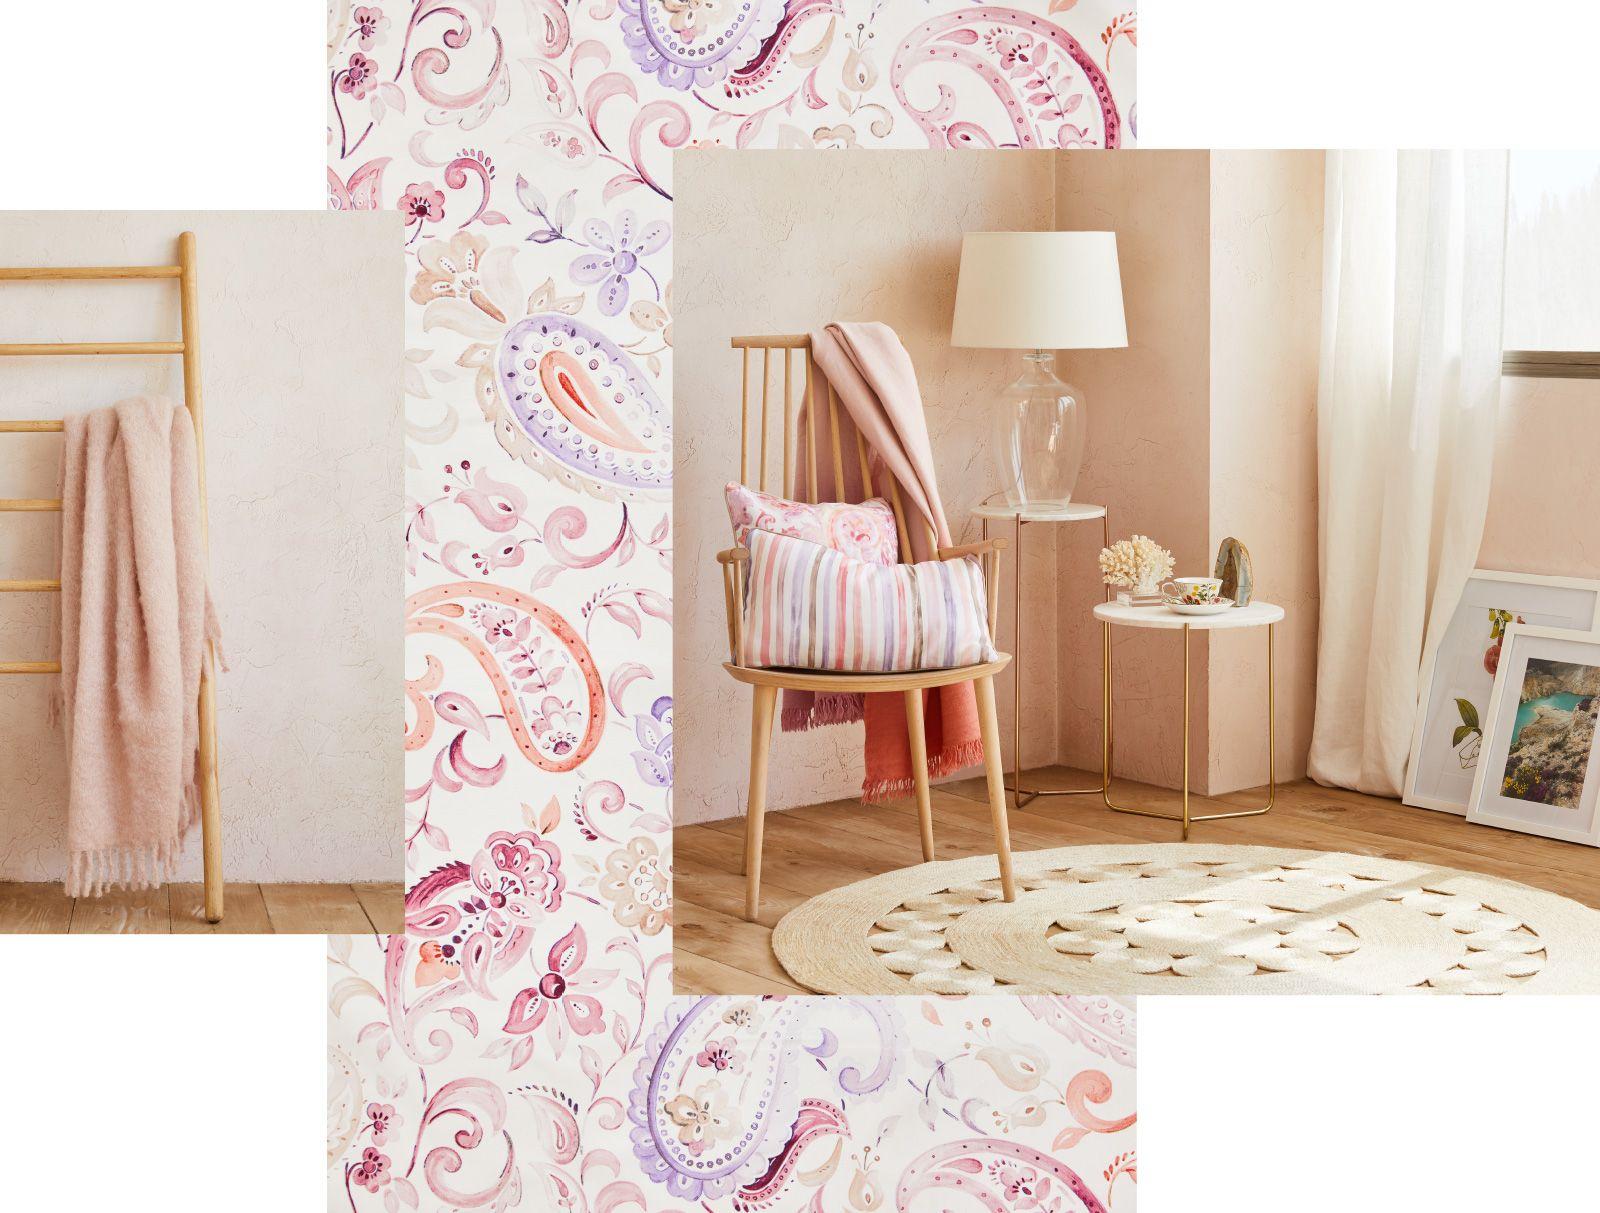 Zara Home Lamp Shades Keramikdose In Weiß Von Zara Home Ca Cm In